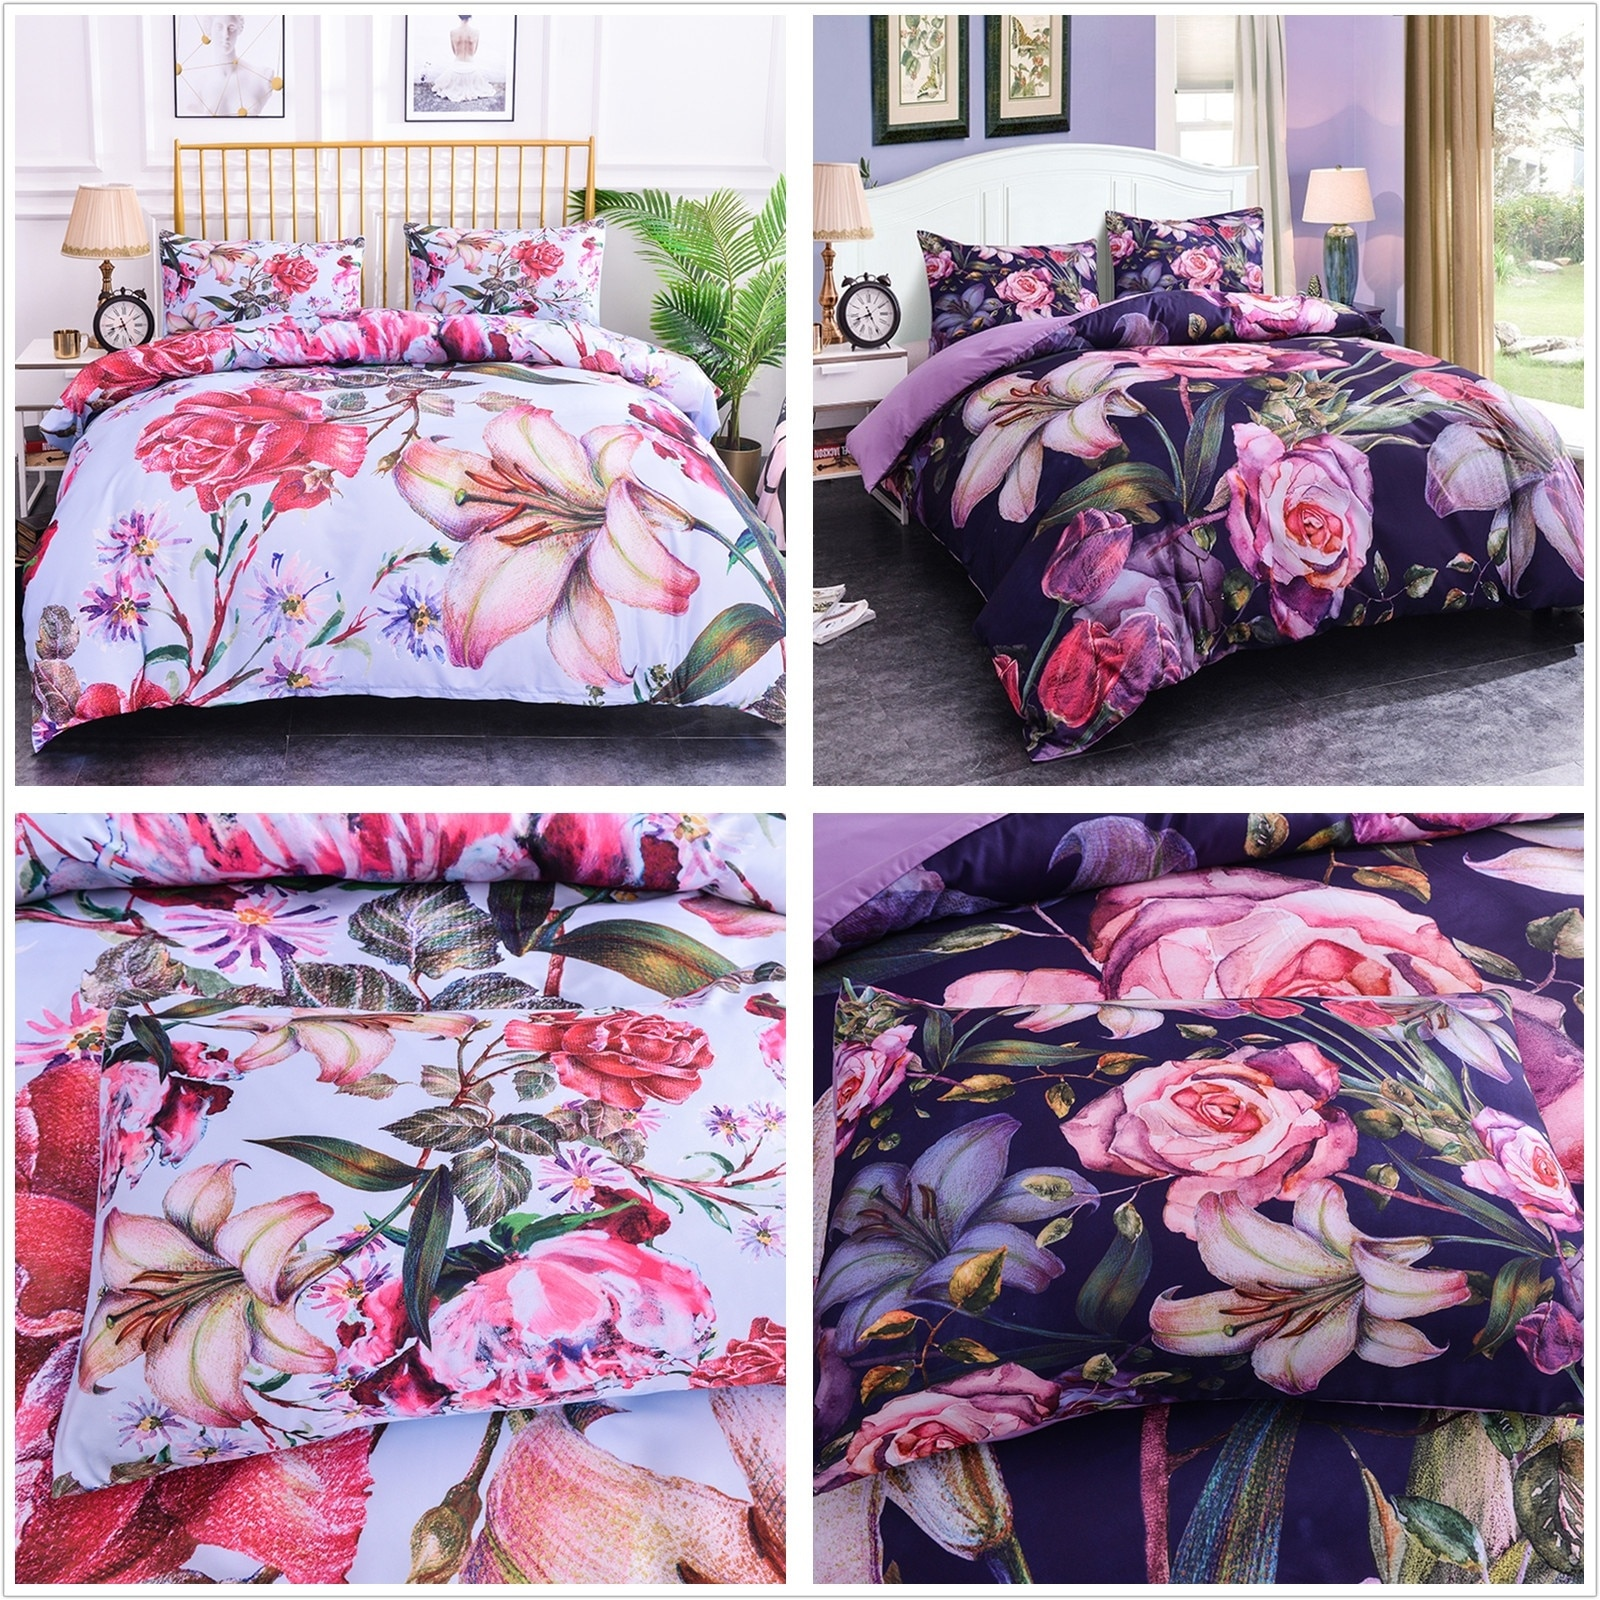 Juegos de cama con estampado Floral en 3D, ropa de cama rosa, funda de edredón morada, fundas de edredón, juego individual/doble/completo/Queen/King Size